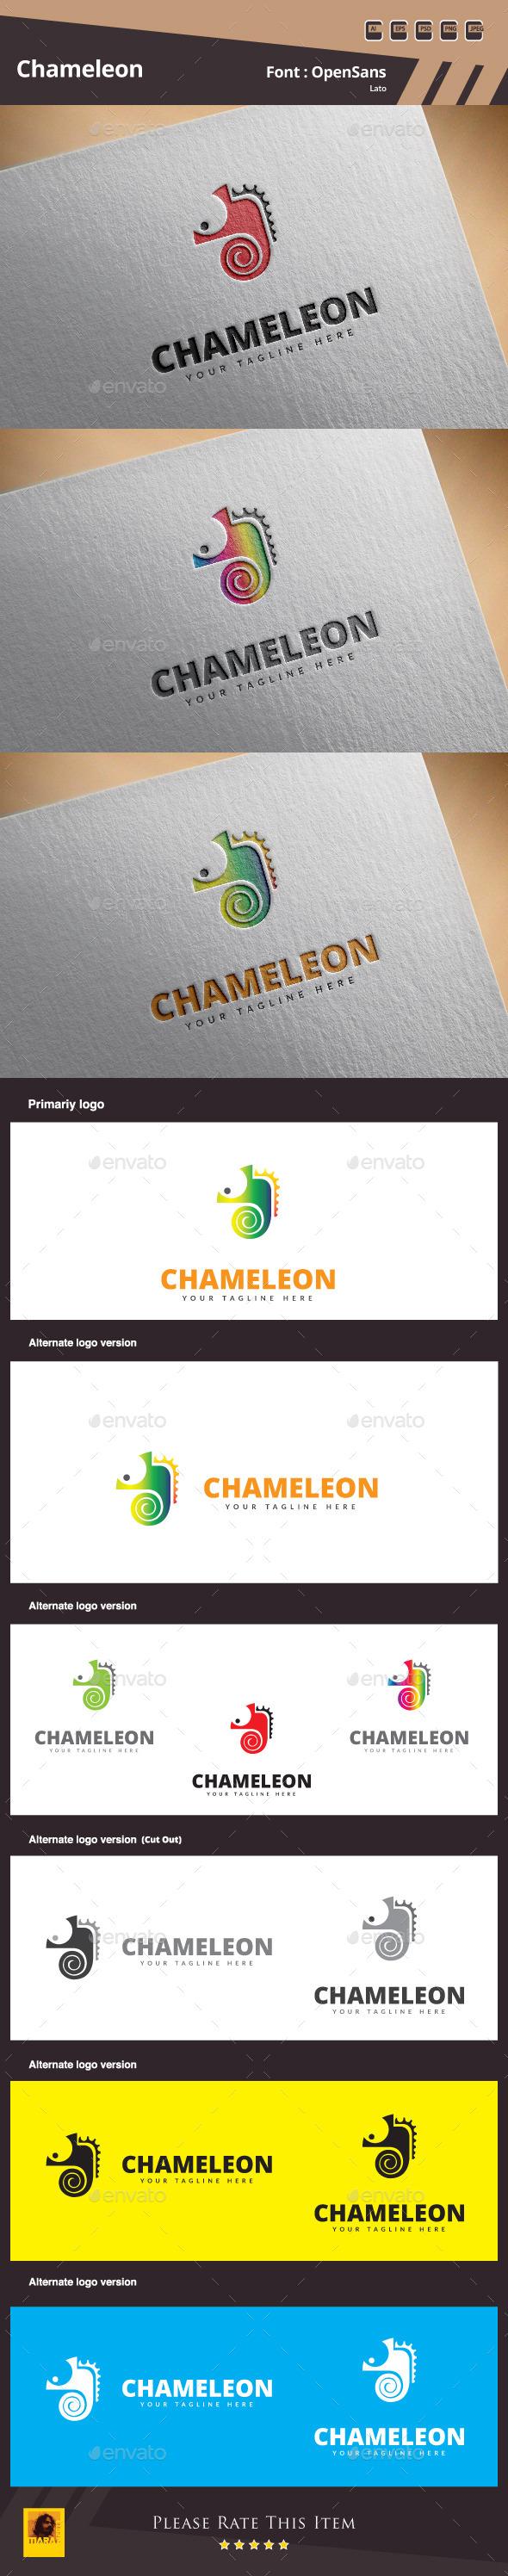 GraphicRiver Chameleon Logo Template 11073594